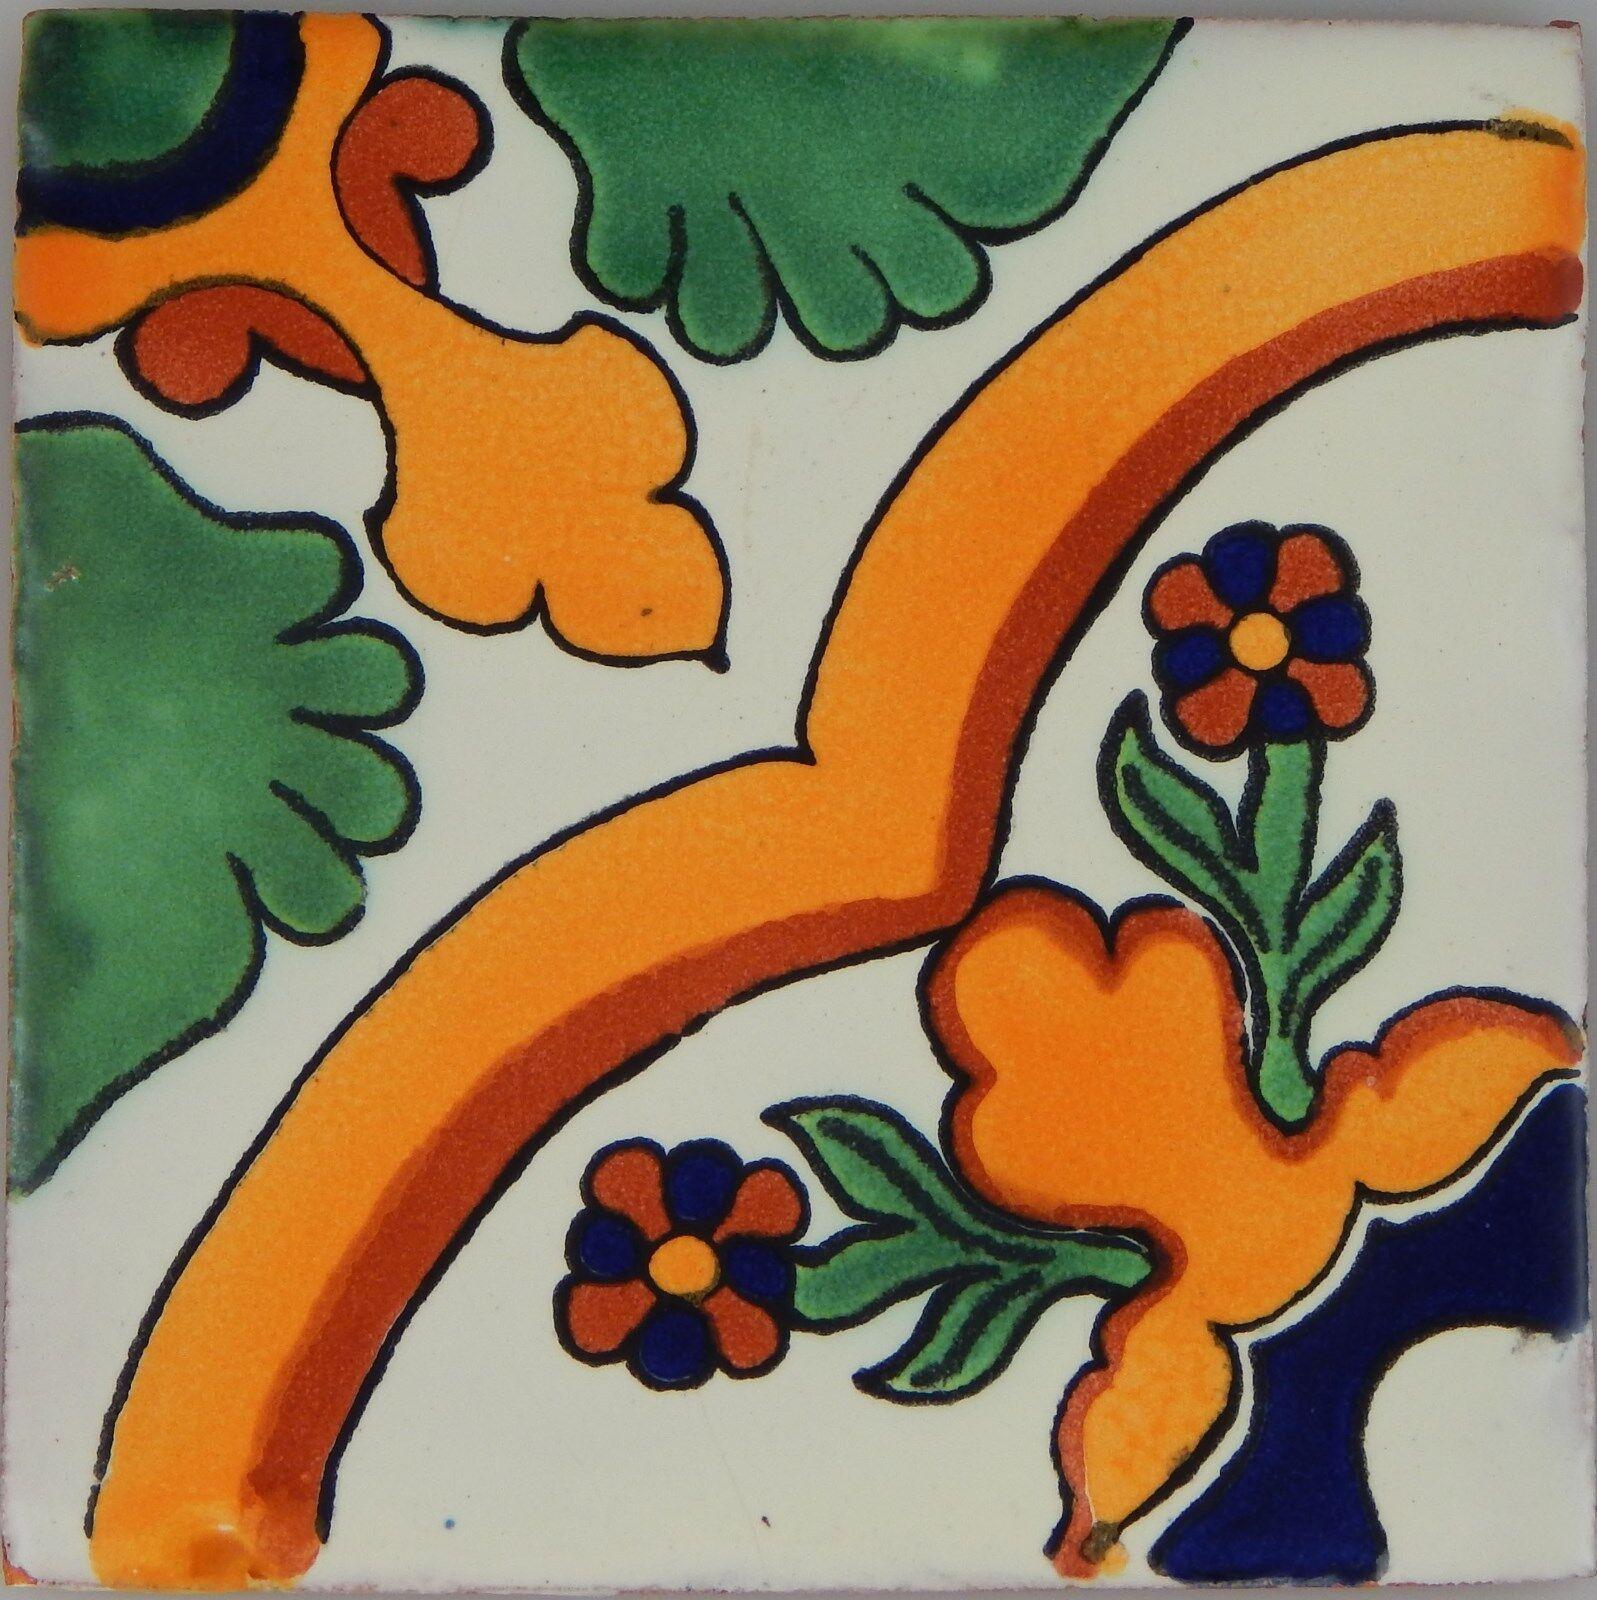 C351- Mexican Handmade Talavera Clay Tile Folk Art 4x4